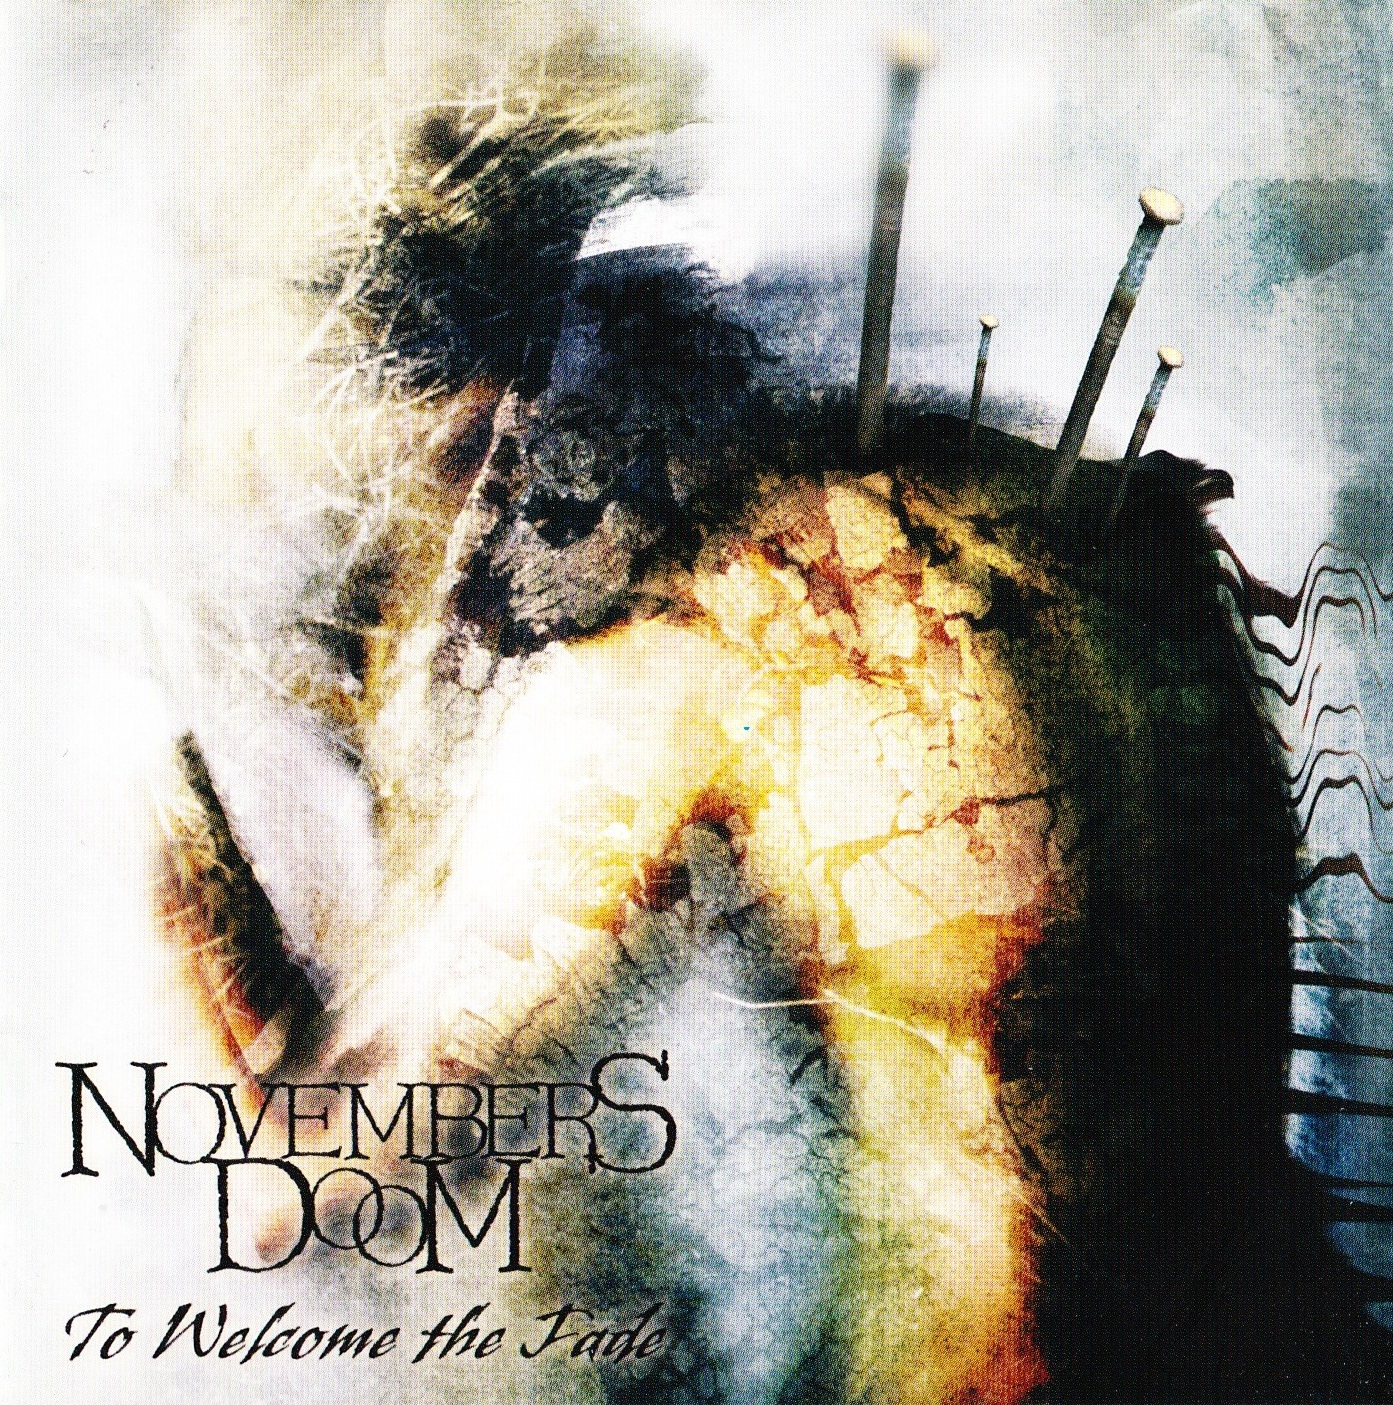 Novembers Doom — To Welcome The Fade (2002)